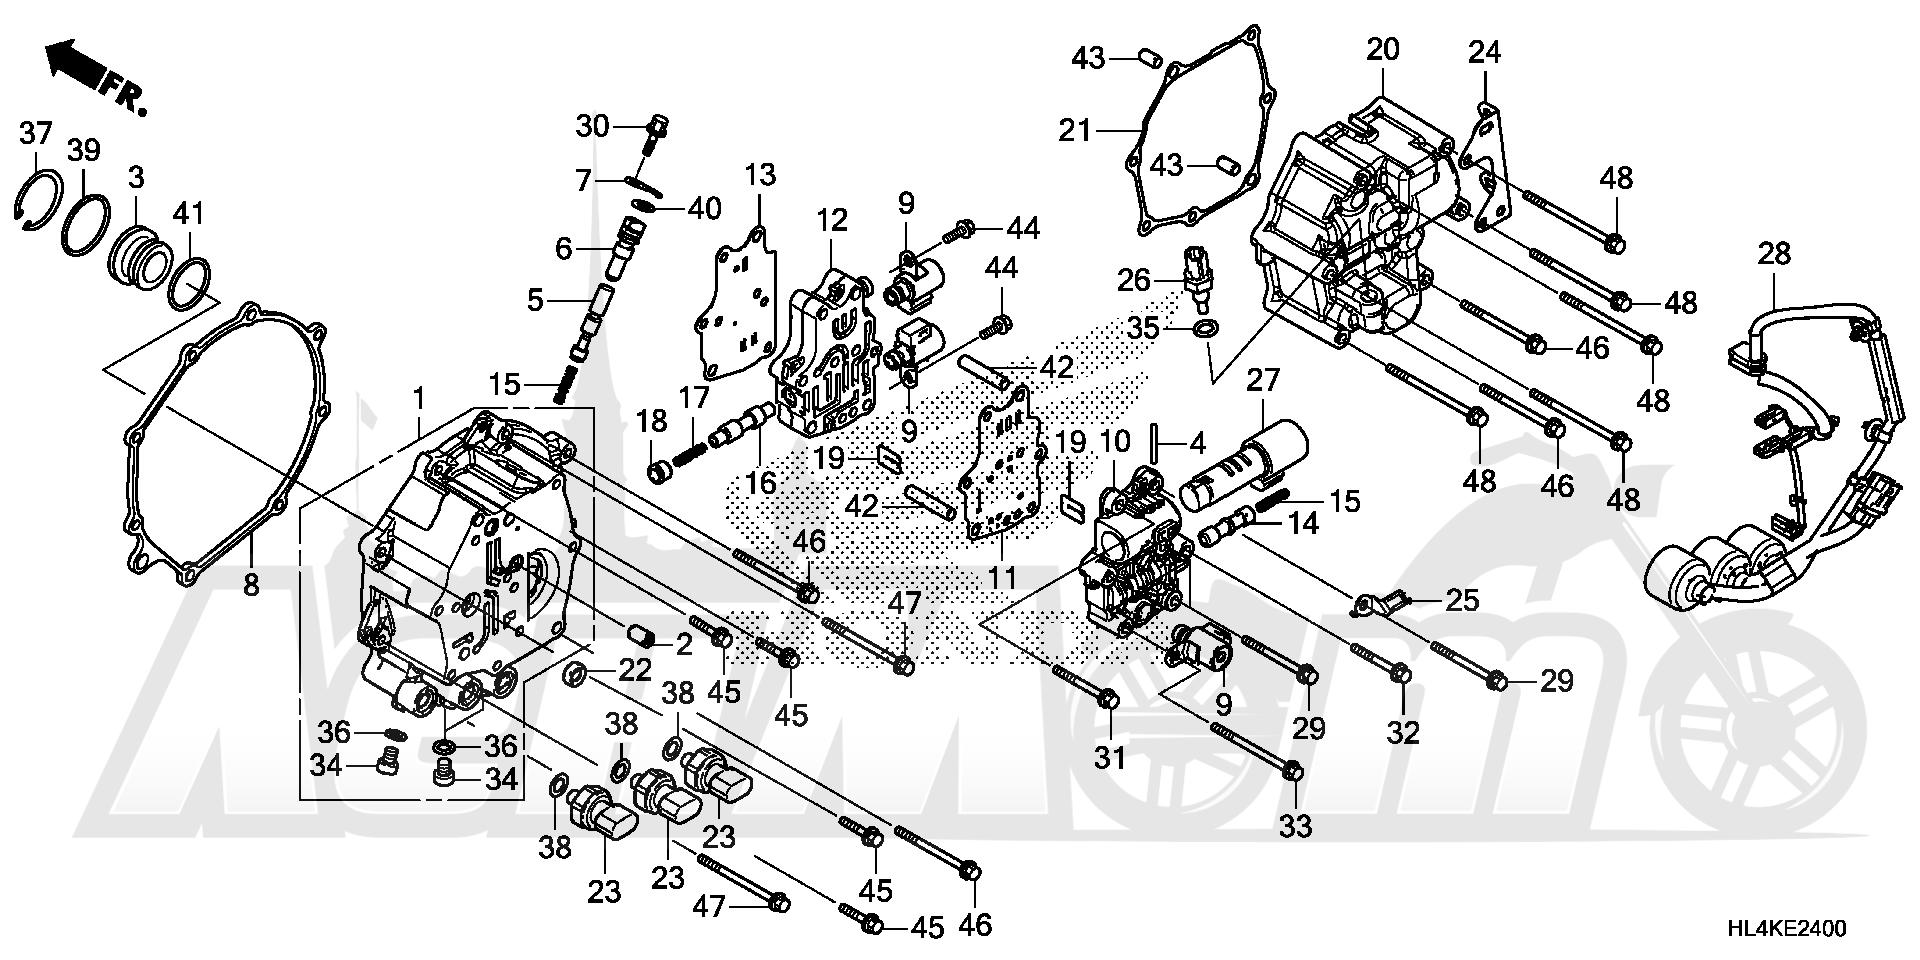 Запчасти для Квадроцикла Honda 2019 SXS1000M5P Раздел: SOLENOID VALVE | реле, соленоид клапан